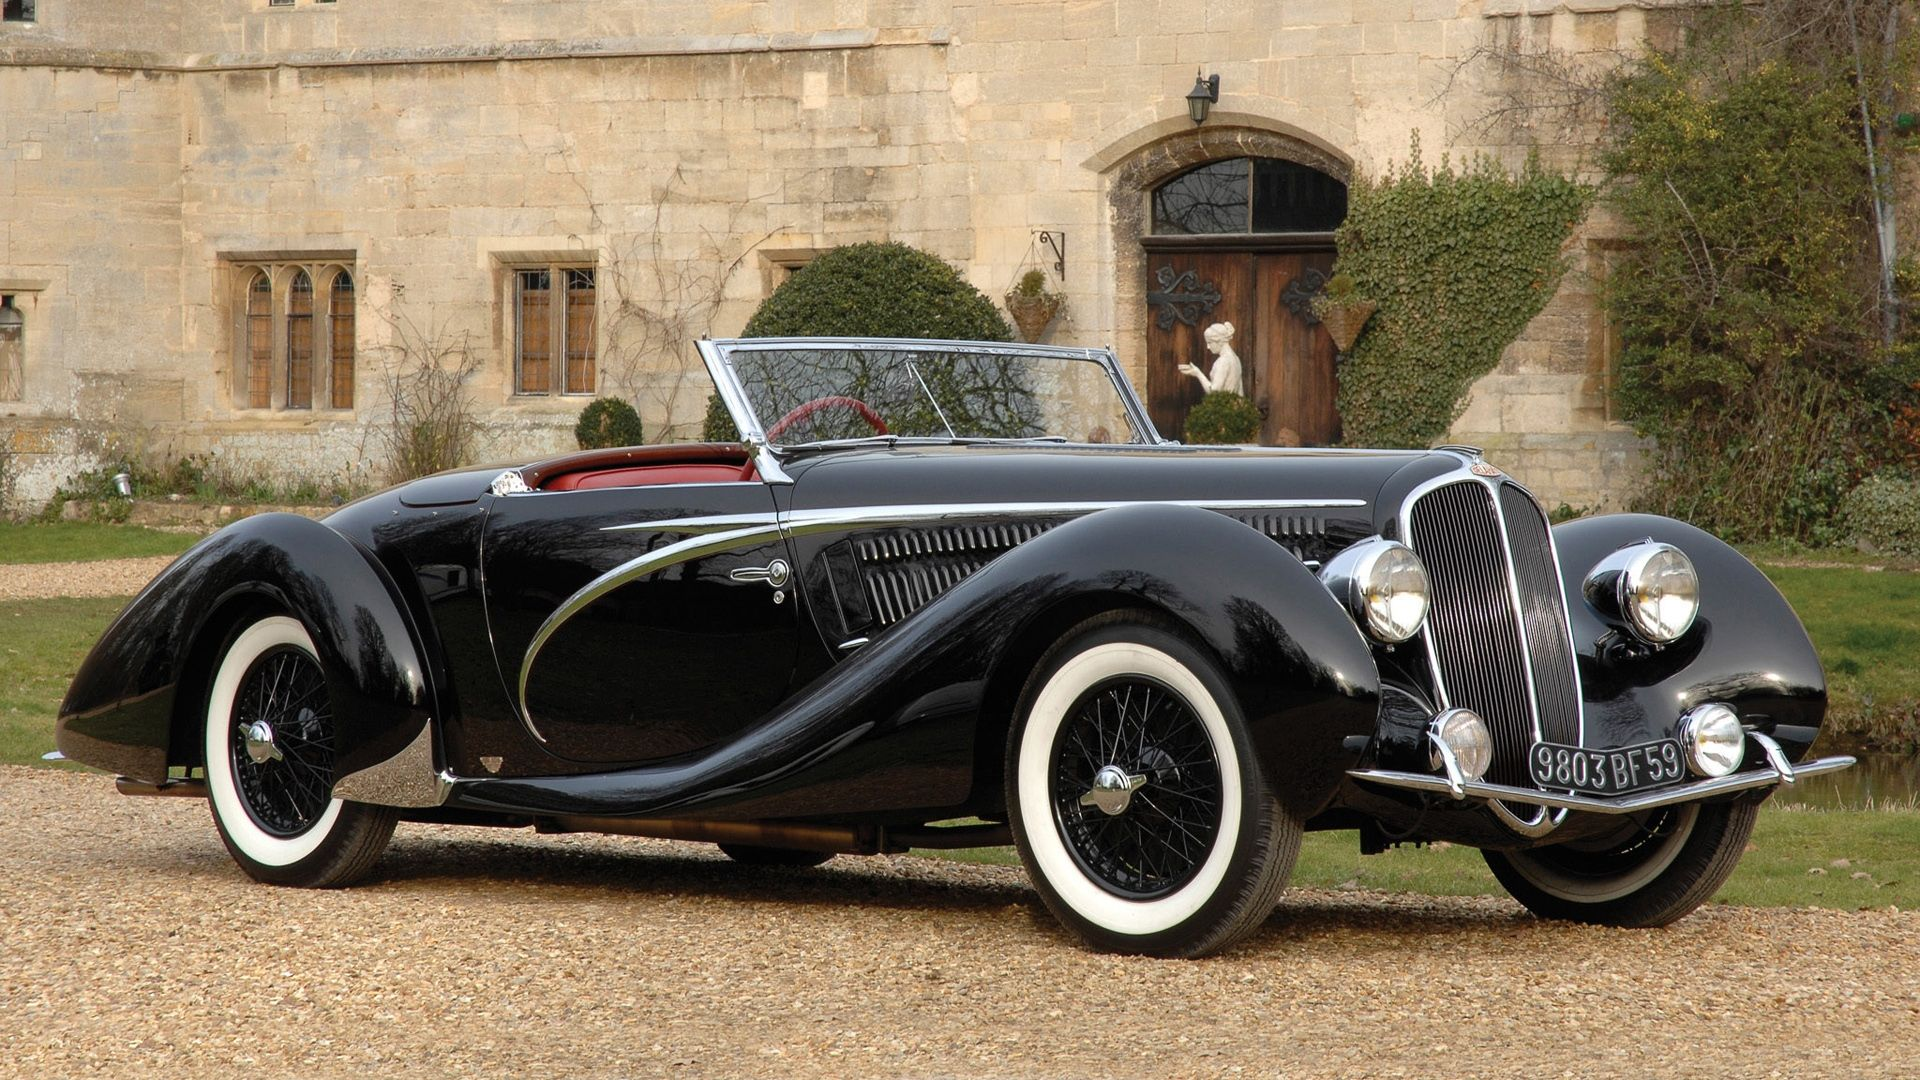 GoSeekit.com - Image - old classic car images | Mood Board 12: Cars ...